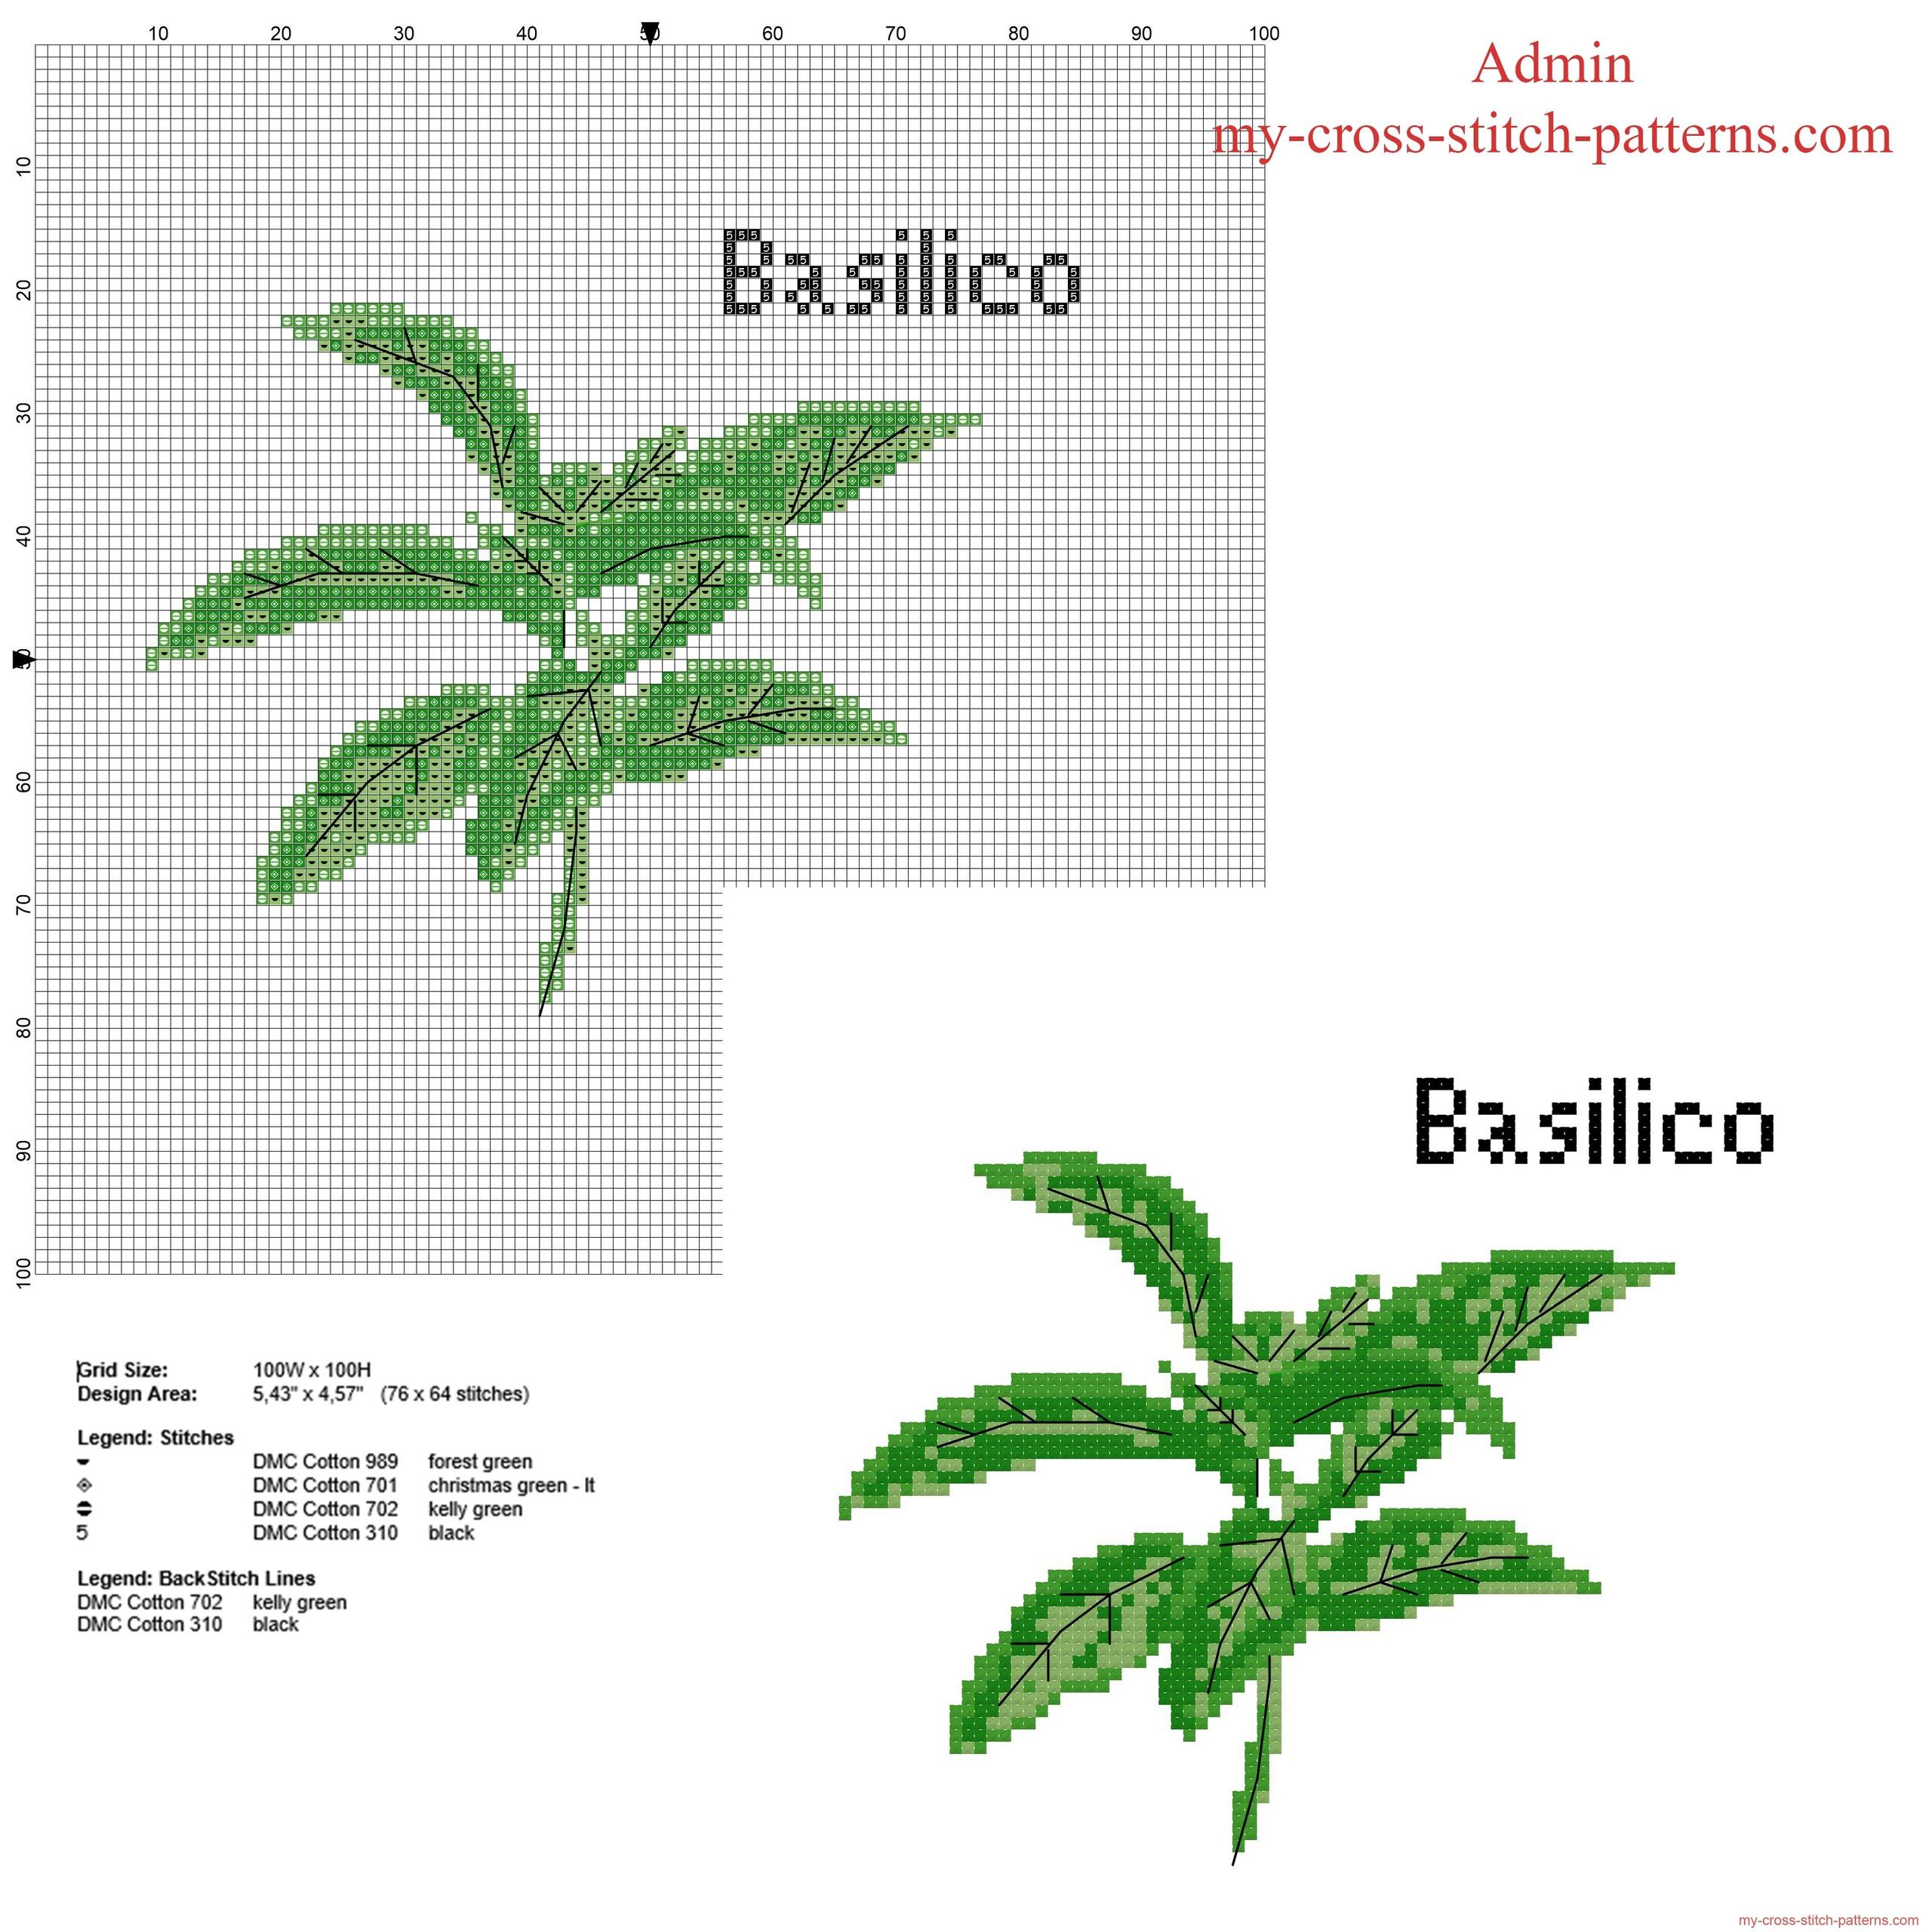 basilico_erba_aromatica_schema_punto_croce_gratis